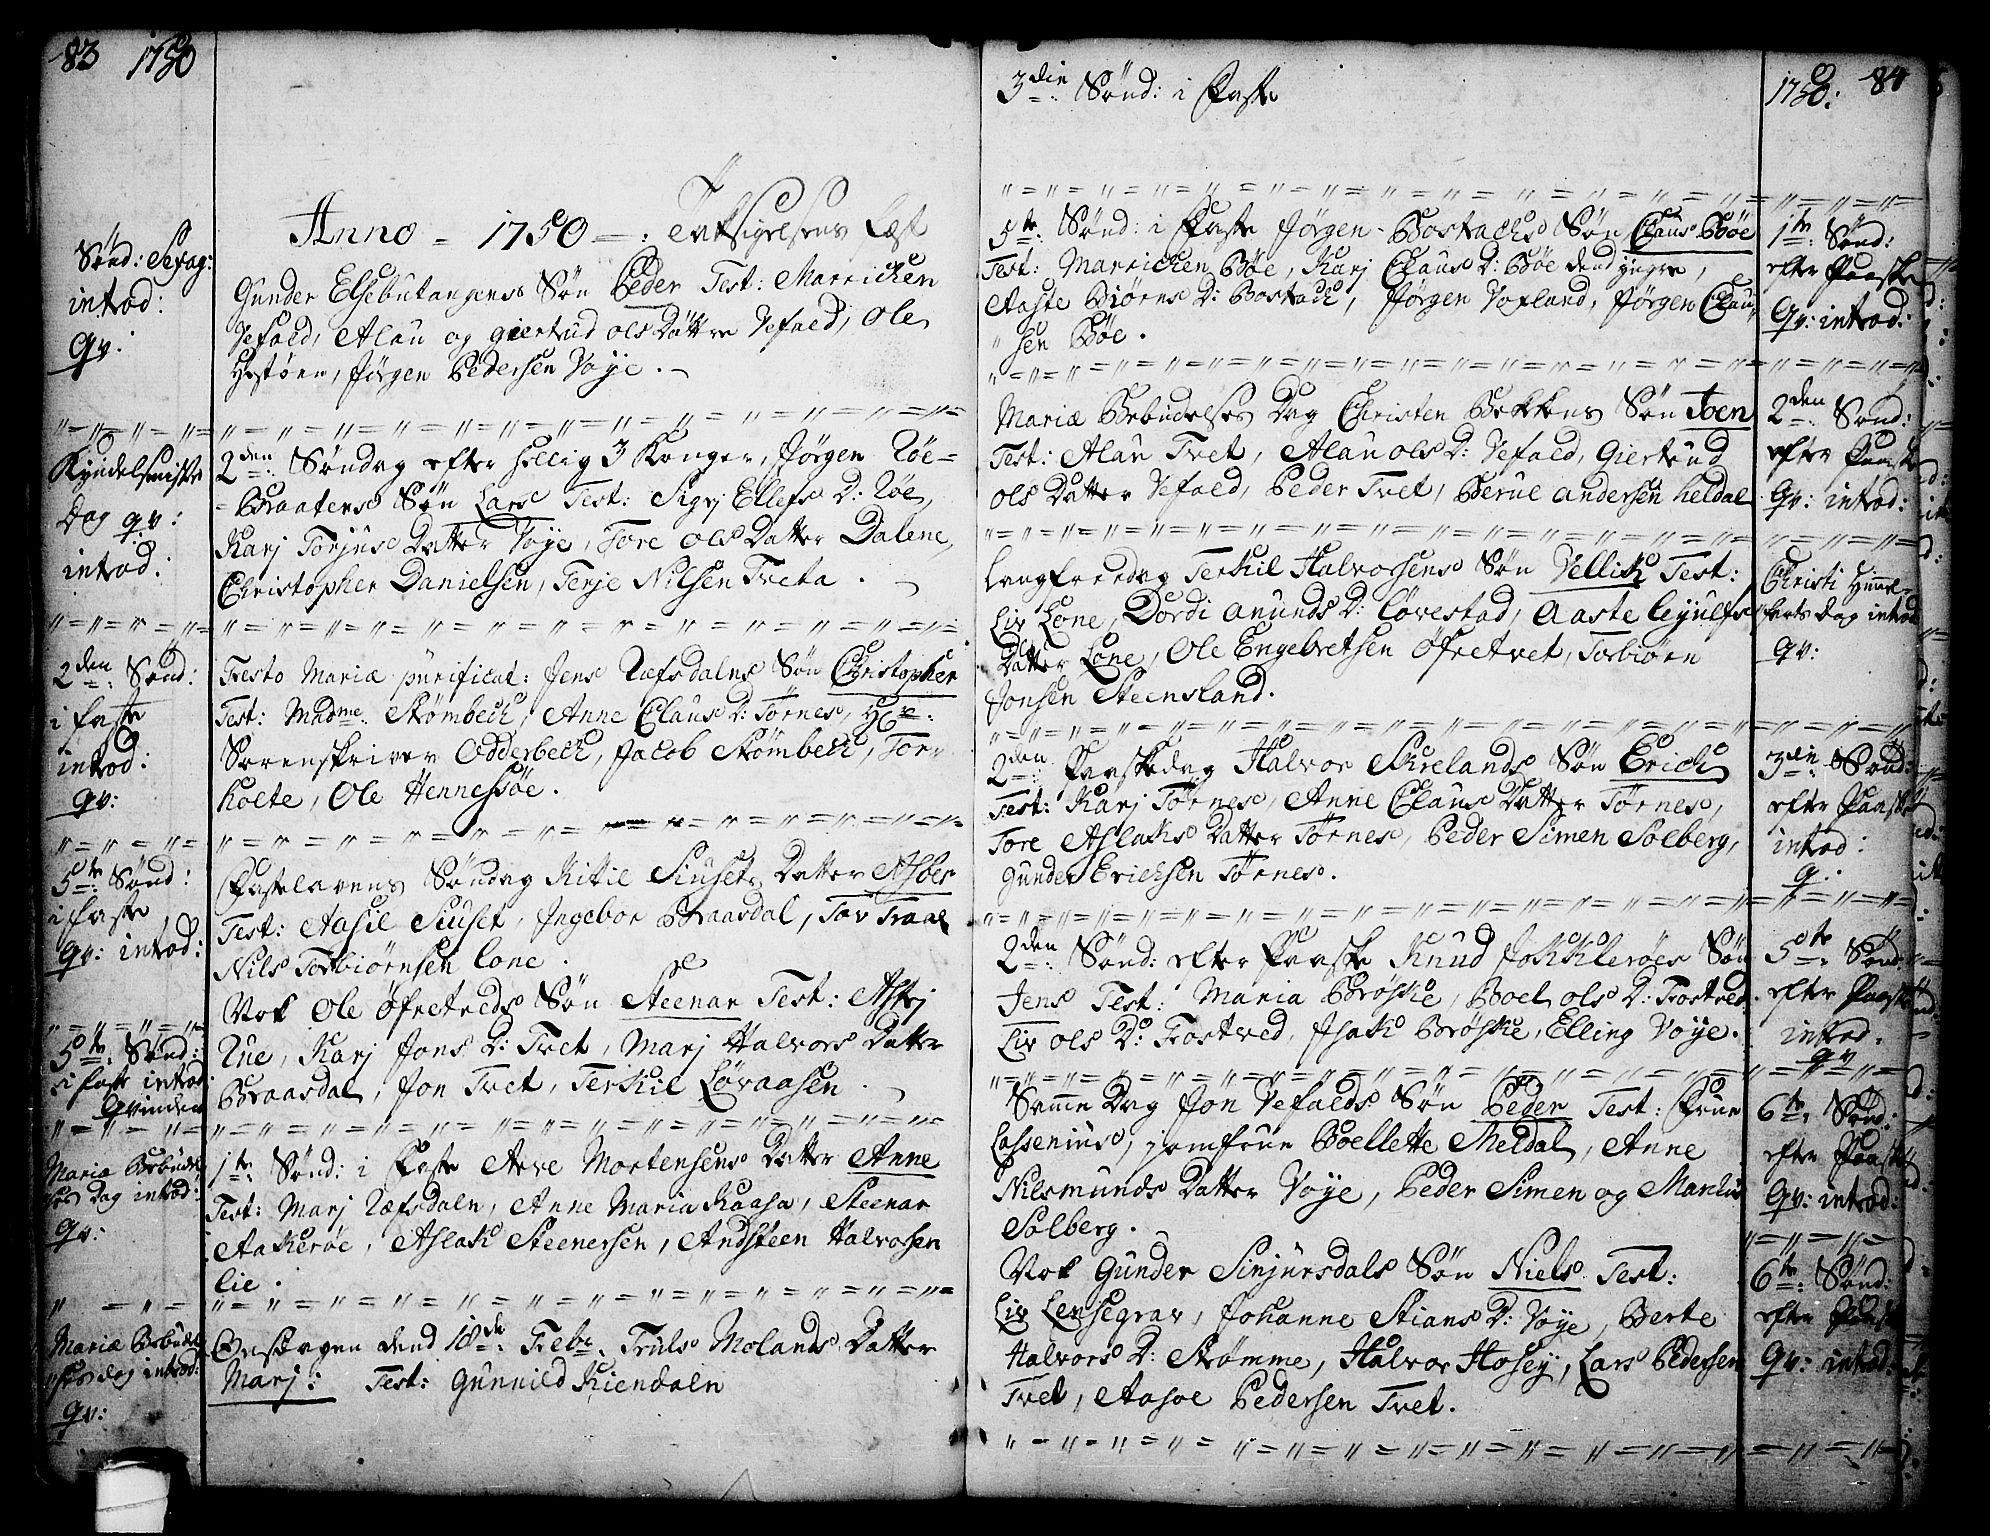 SAKO, Drangedal kirkebøker, F/Fa/L0002: Ministerialbok nr. 2, 1733-1753, s. 83-84